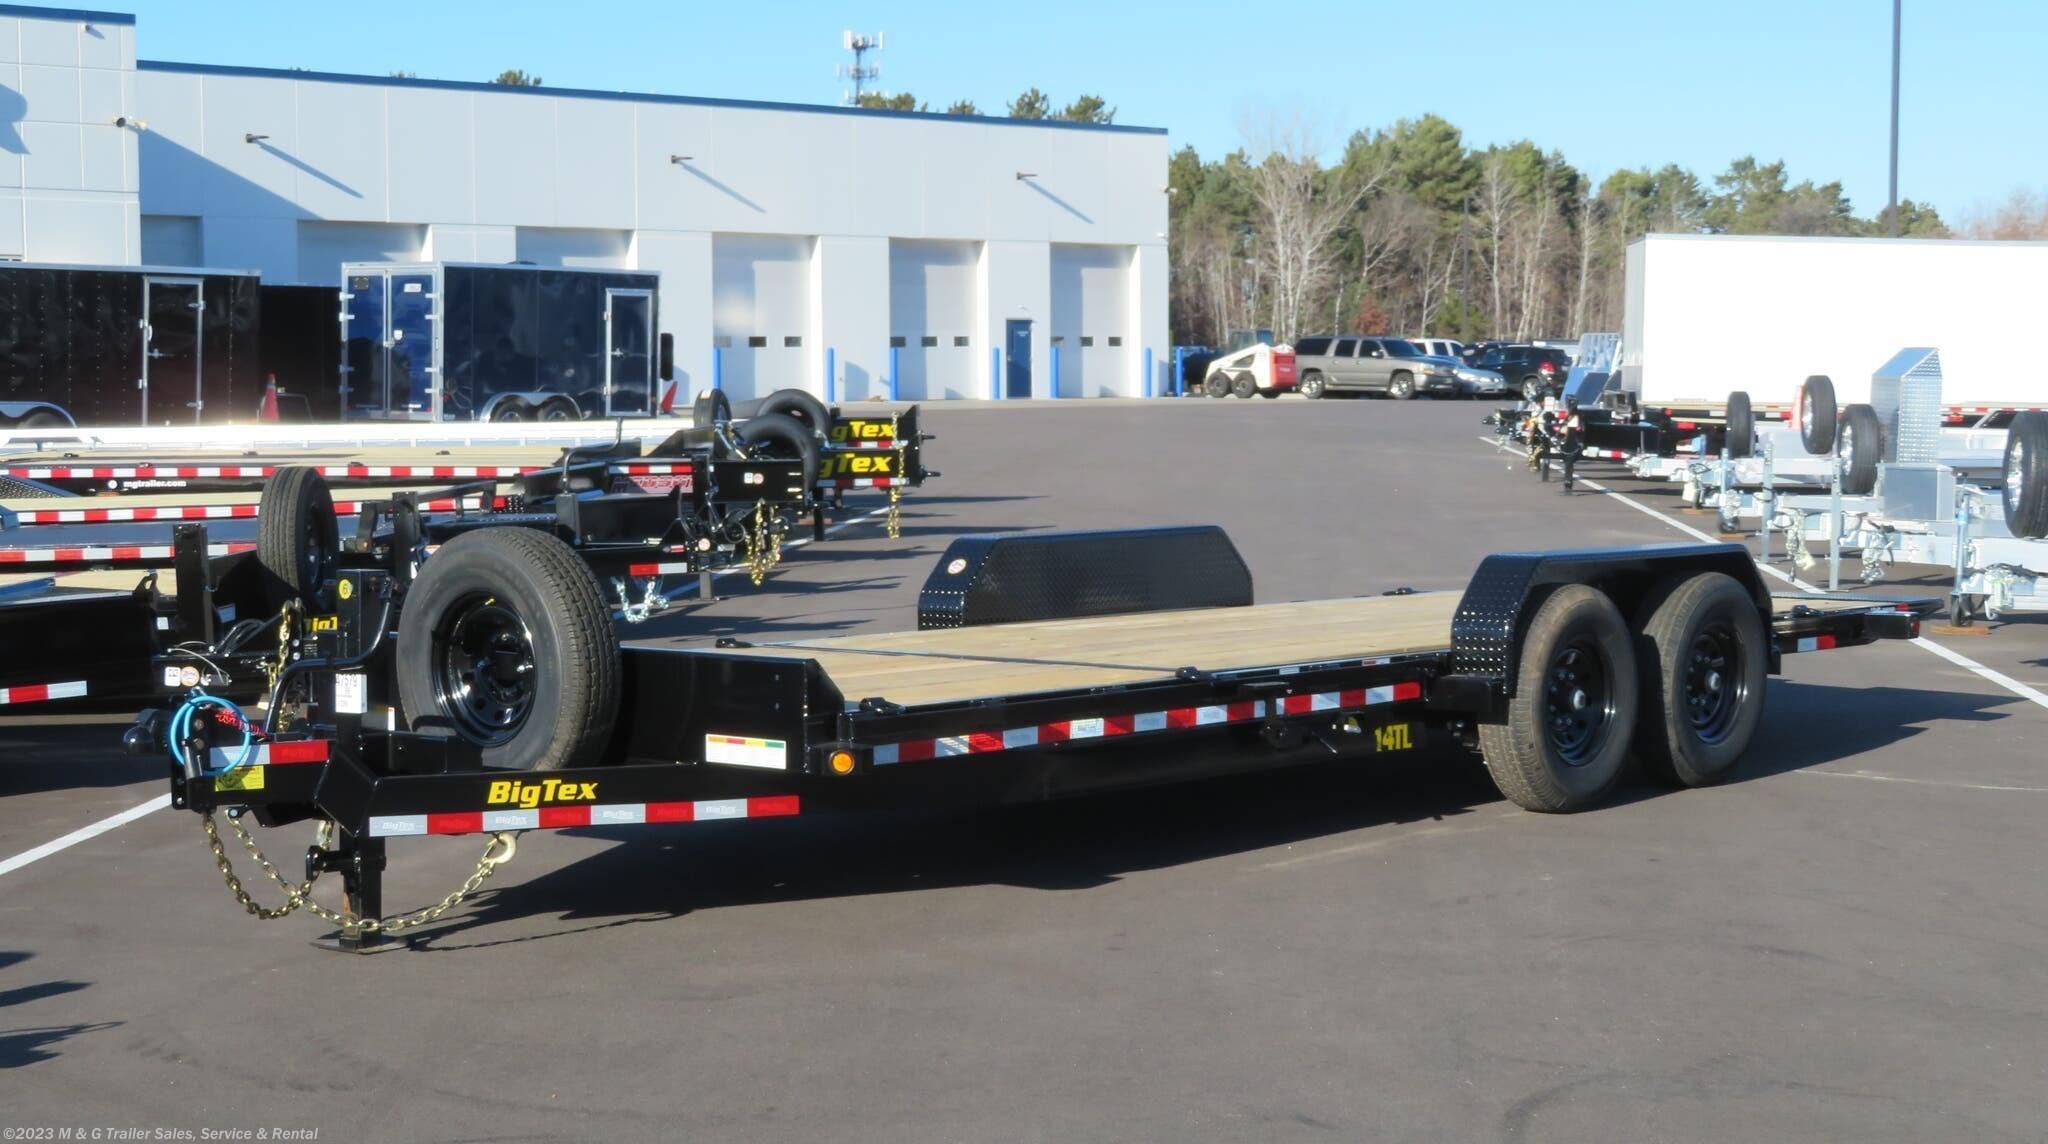 2021 Big Tex 22' Tilt Bed - 6' Stationary Deck - Stock #132143